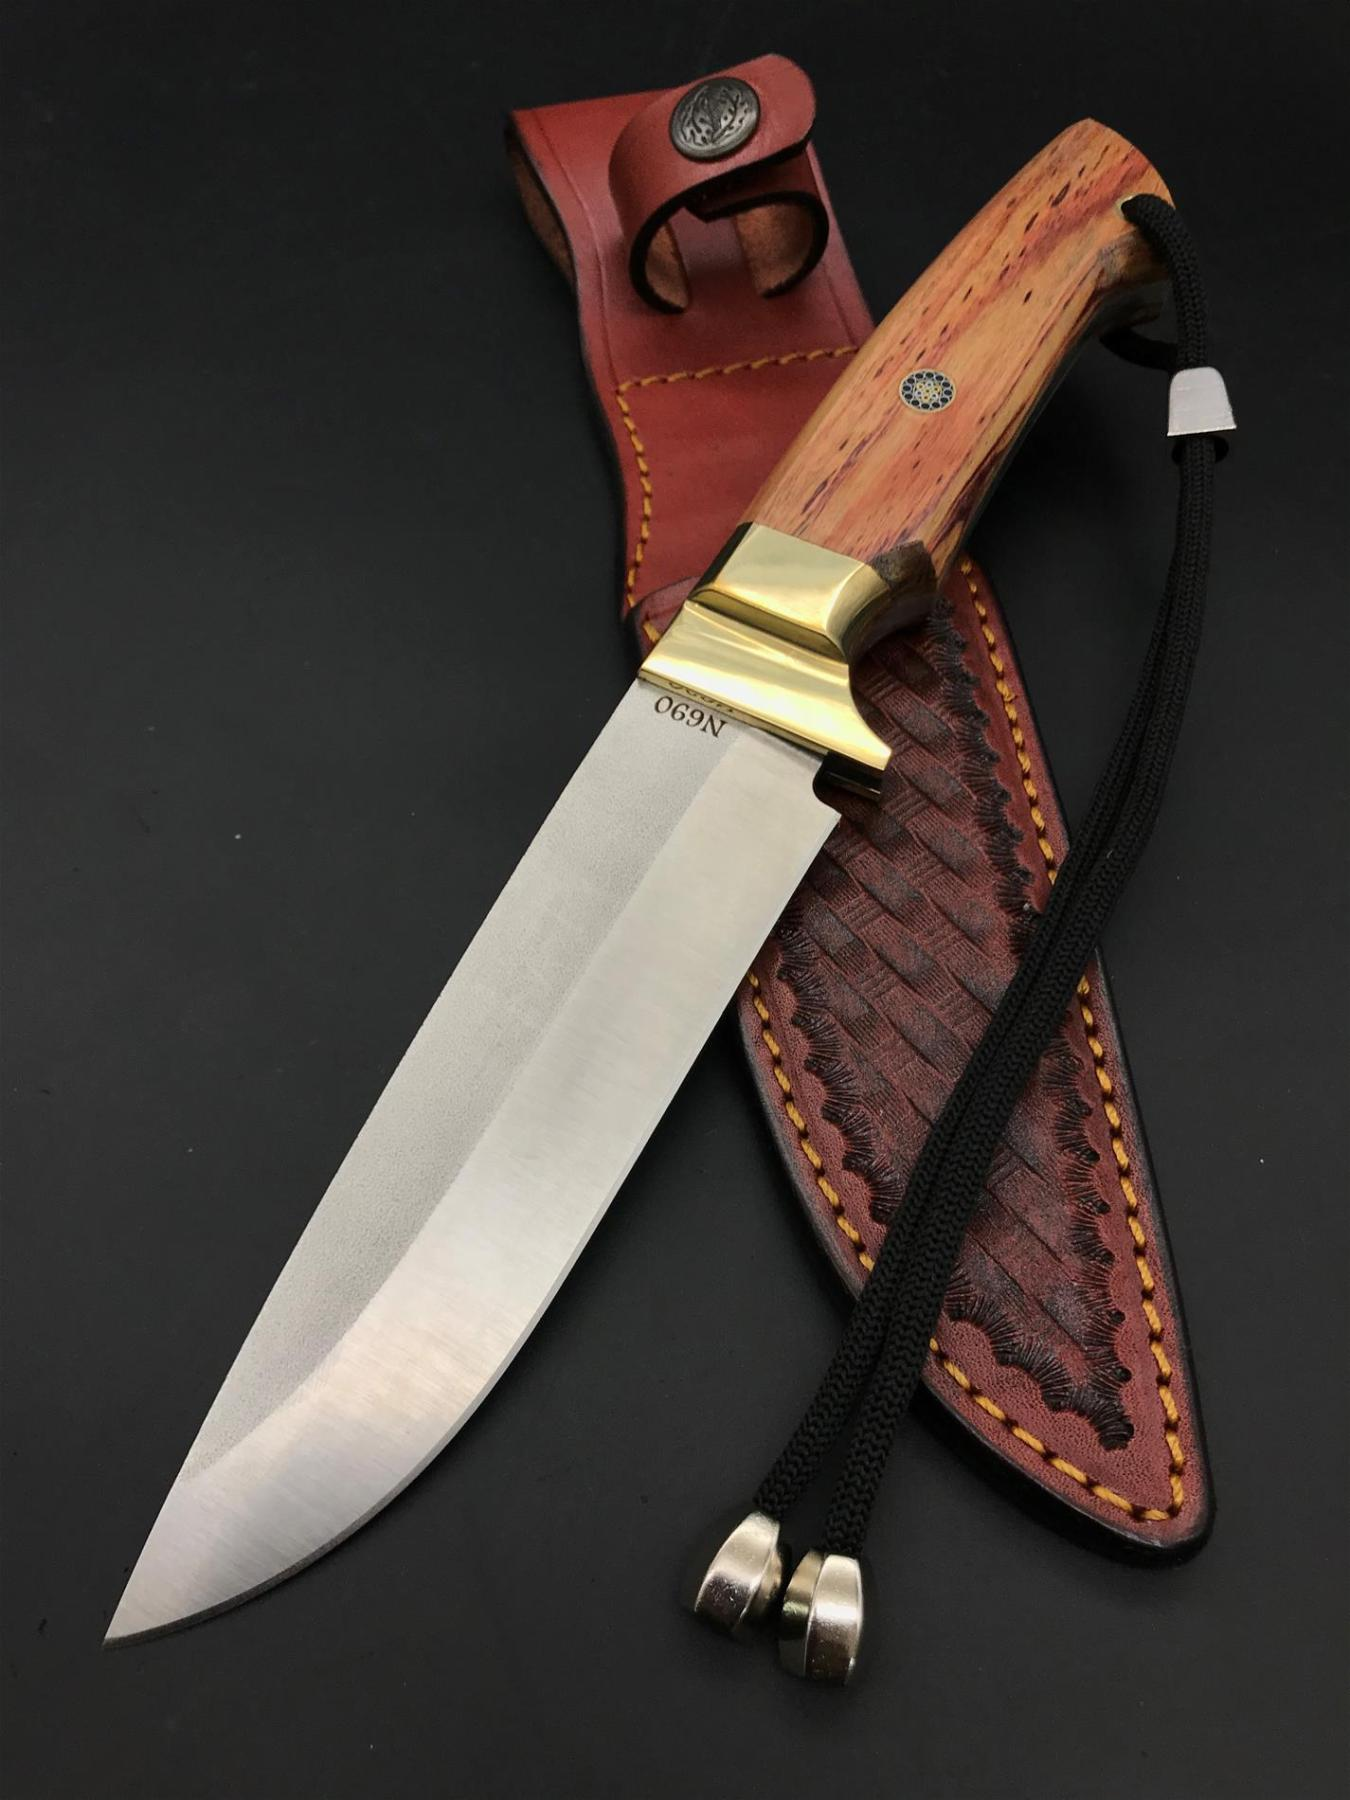 BOHLER N690 Bushcraft Camping Knife BB106-3